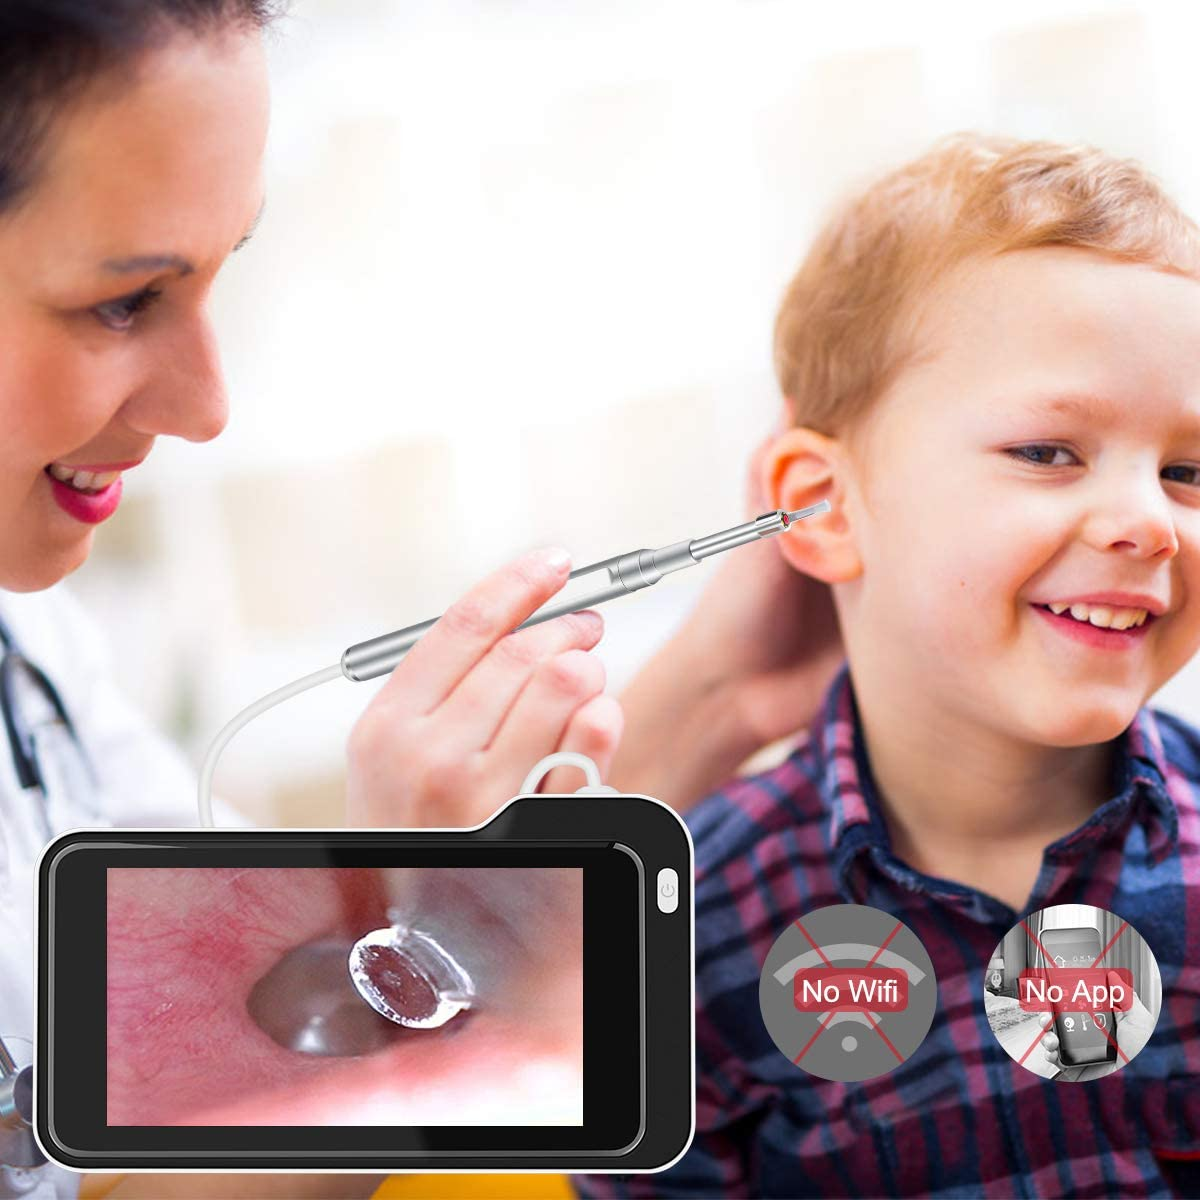 AsperX 5.0 MP Ear Scope with 3.9mm Handheld Ear Camera 1080P HD ...